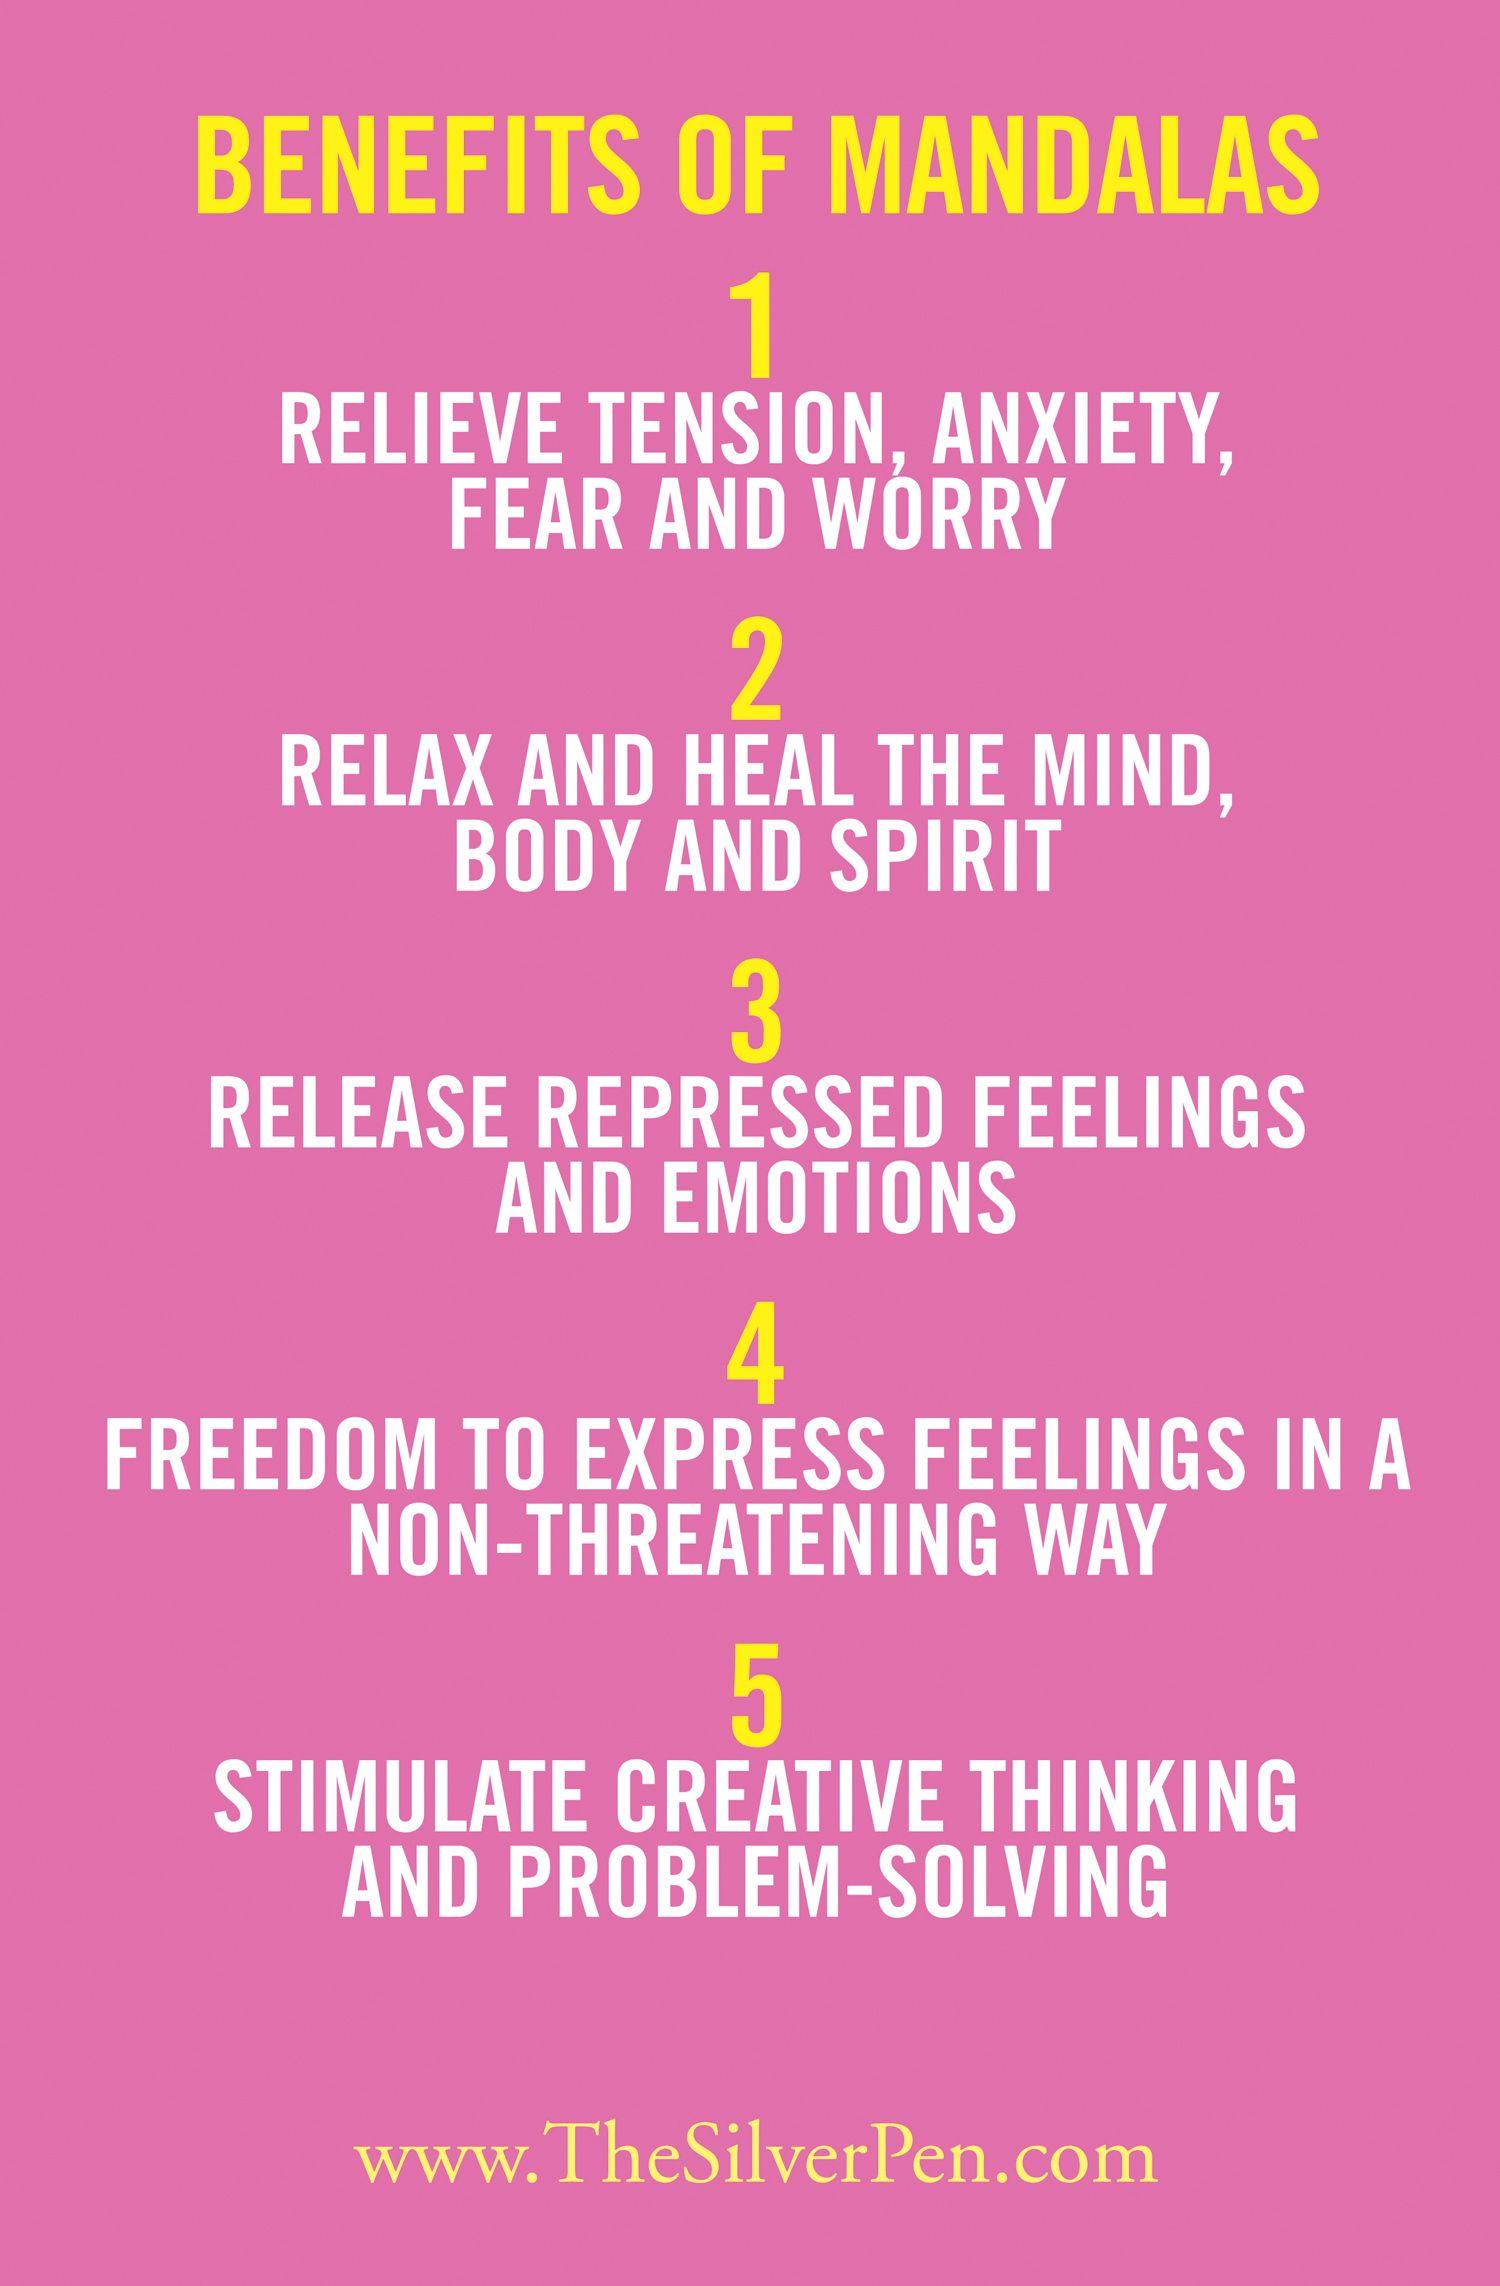 The benefits of mandalas Perfect